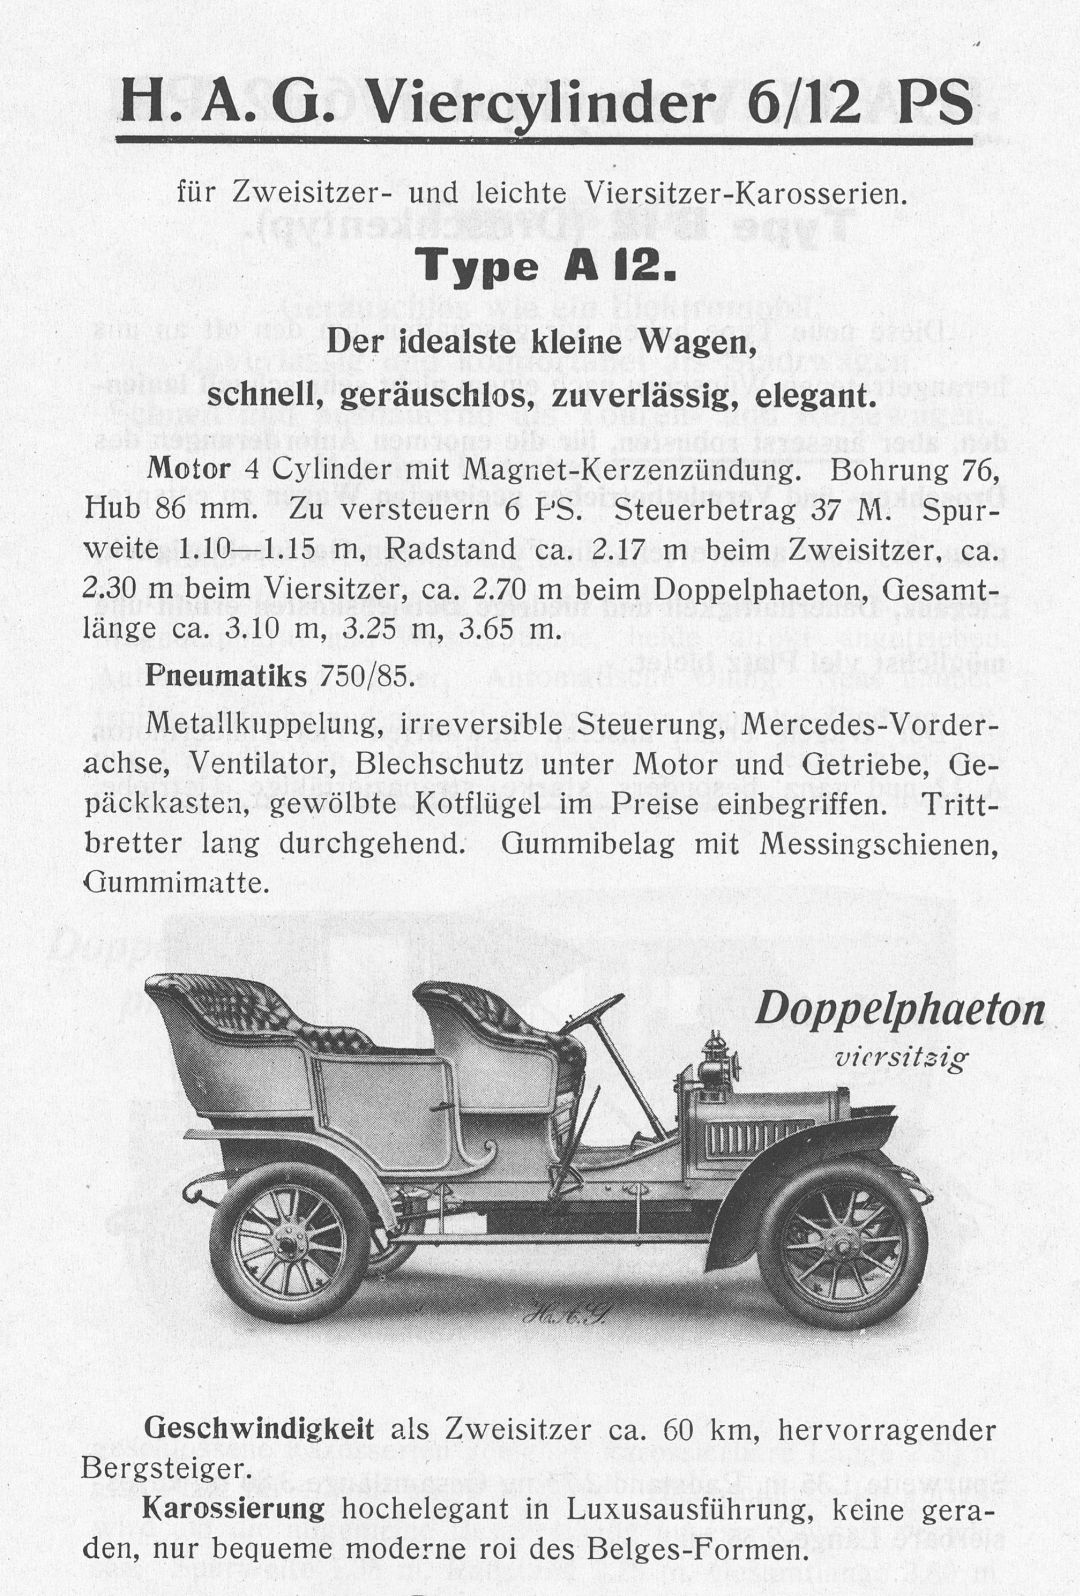 Hansa_Typ_A12_6-12_PS_1908_Galerie